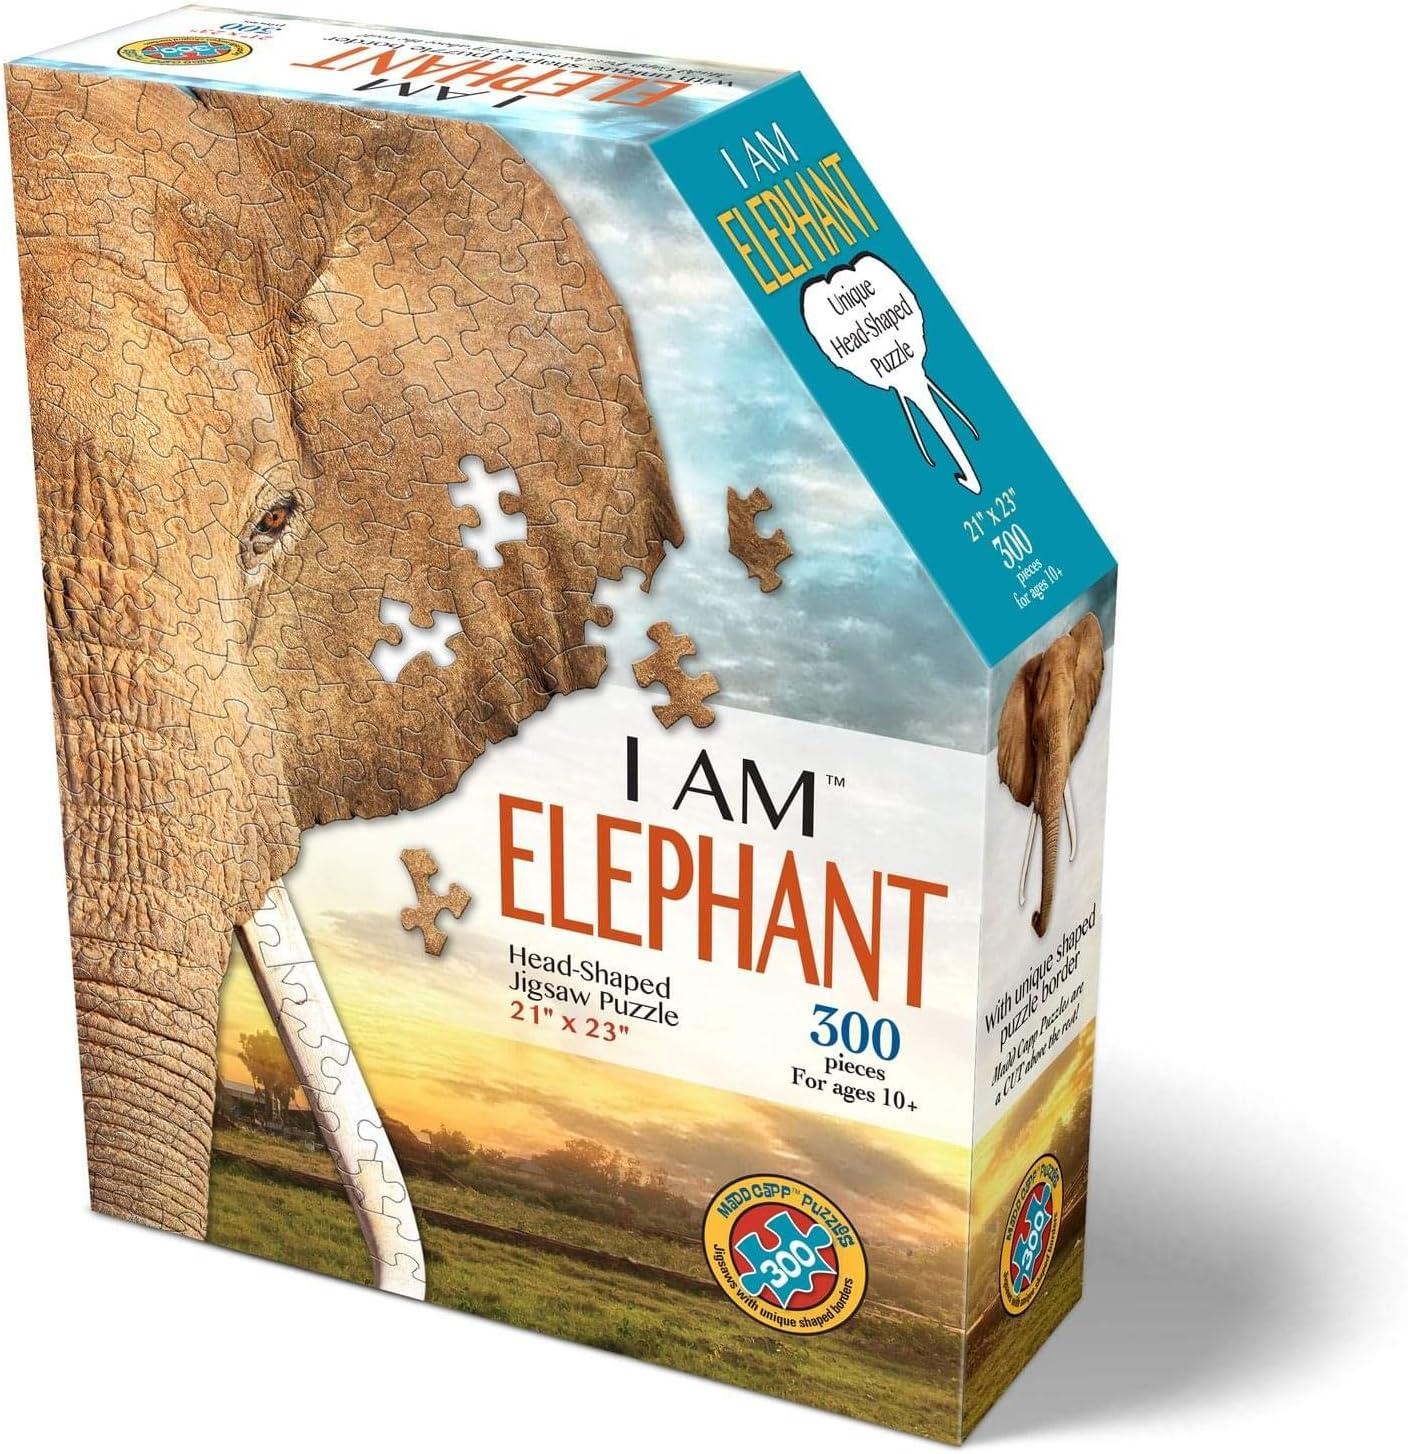 300 Pieces I AM Elephant Animal Shaped Jigsaw Puzzle Madd CAPP Puzzles